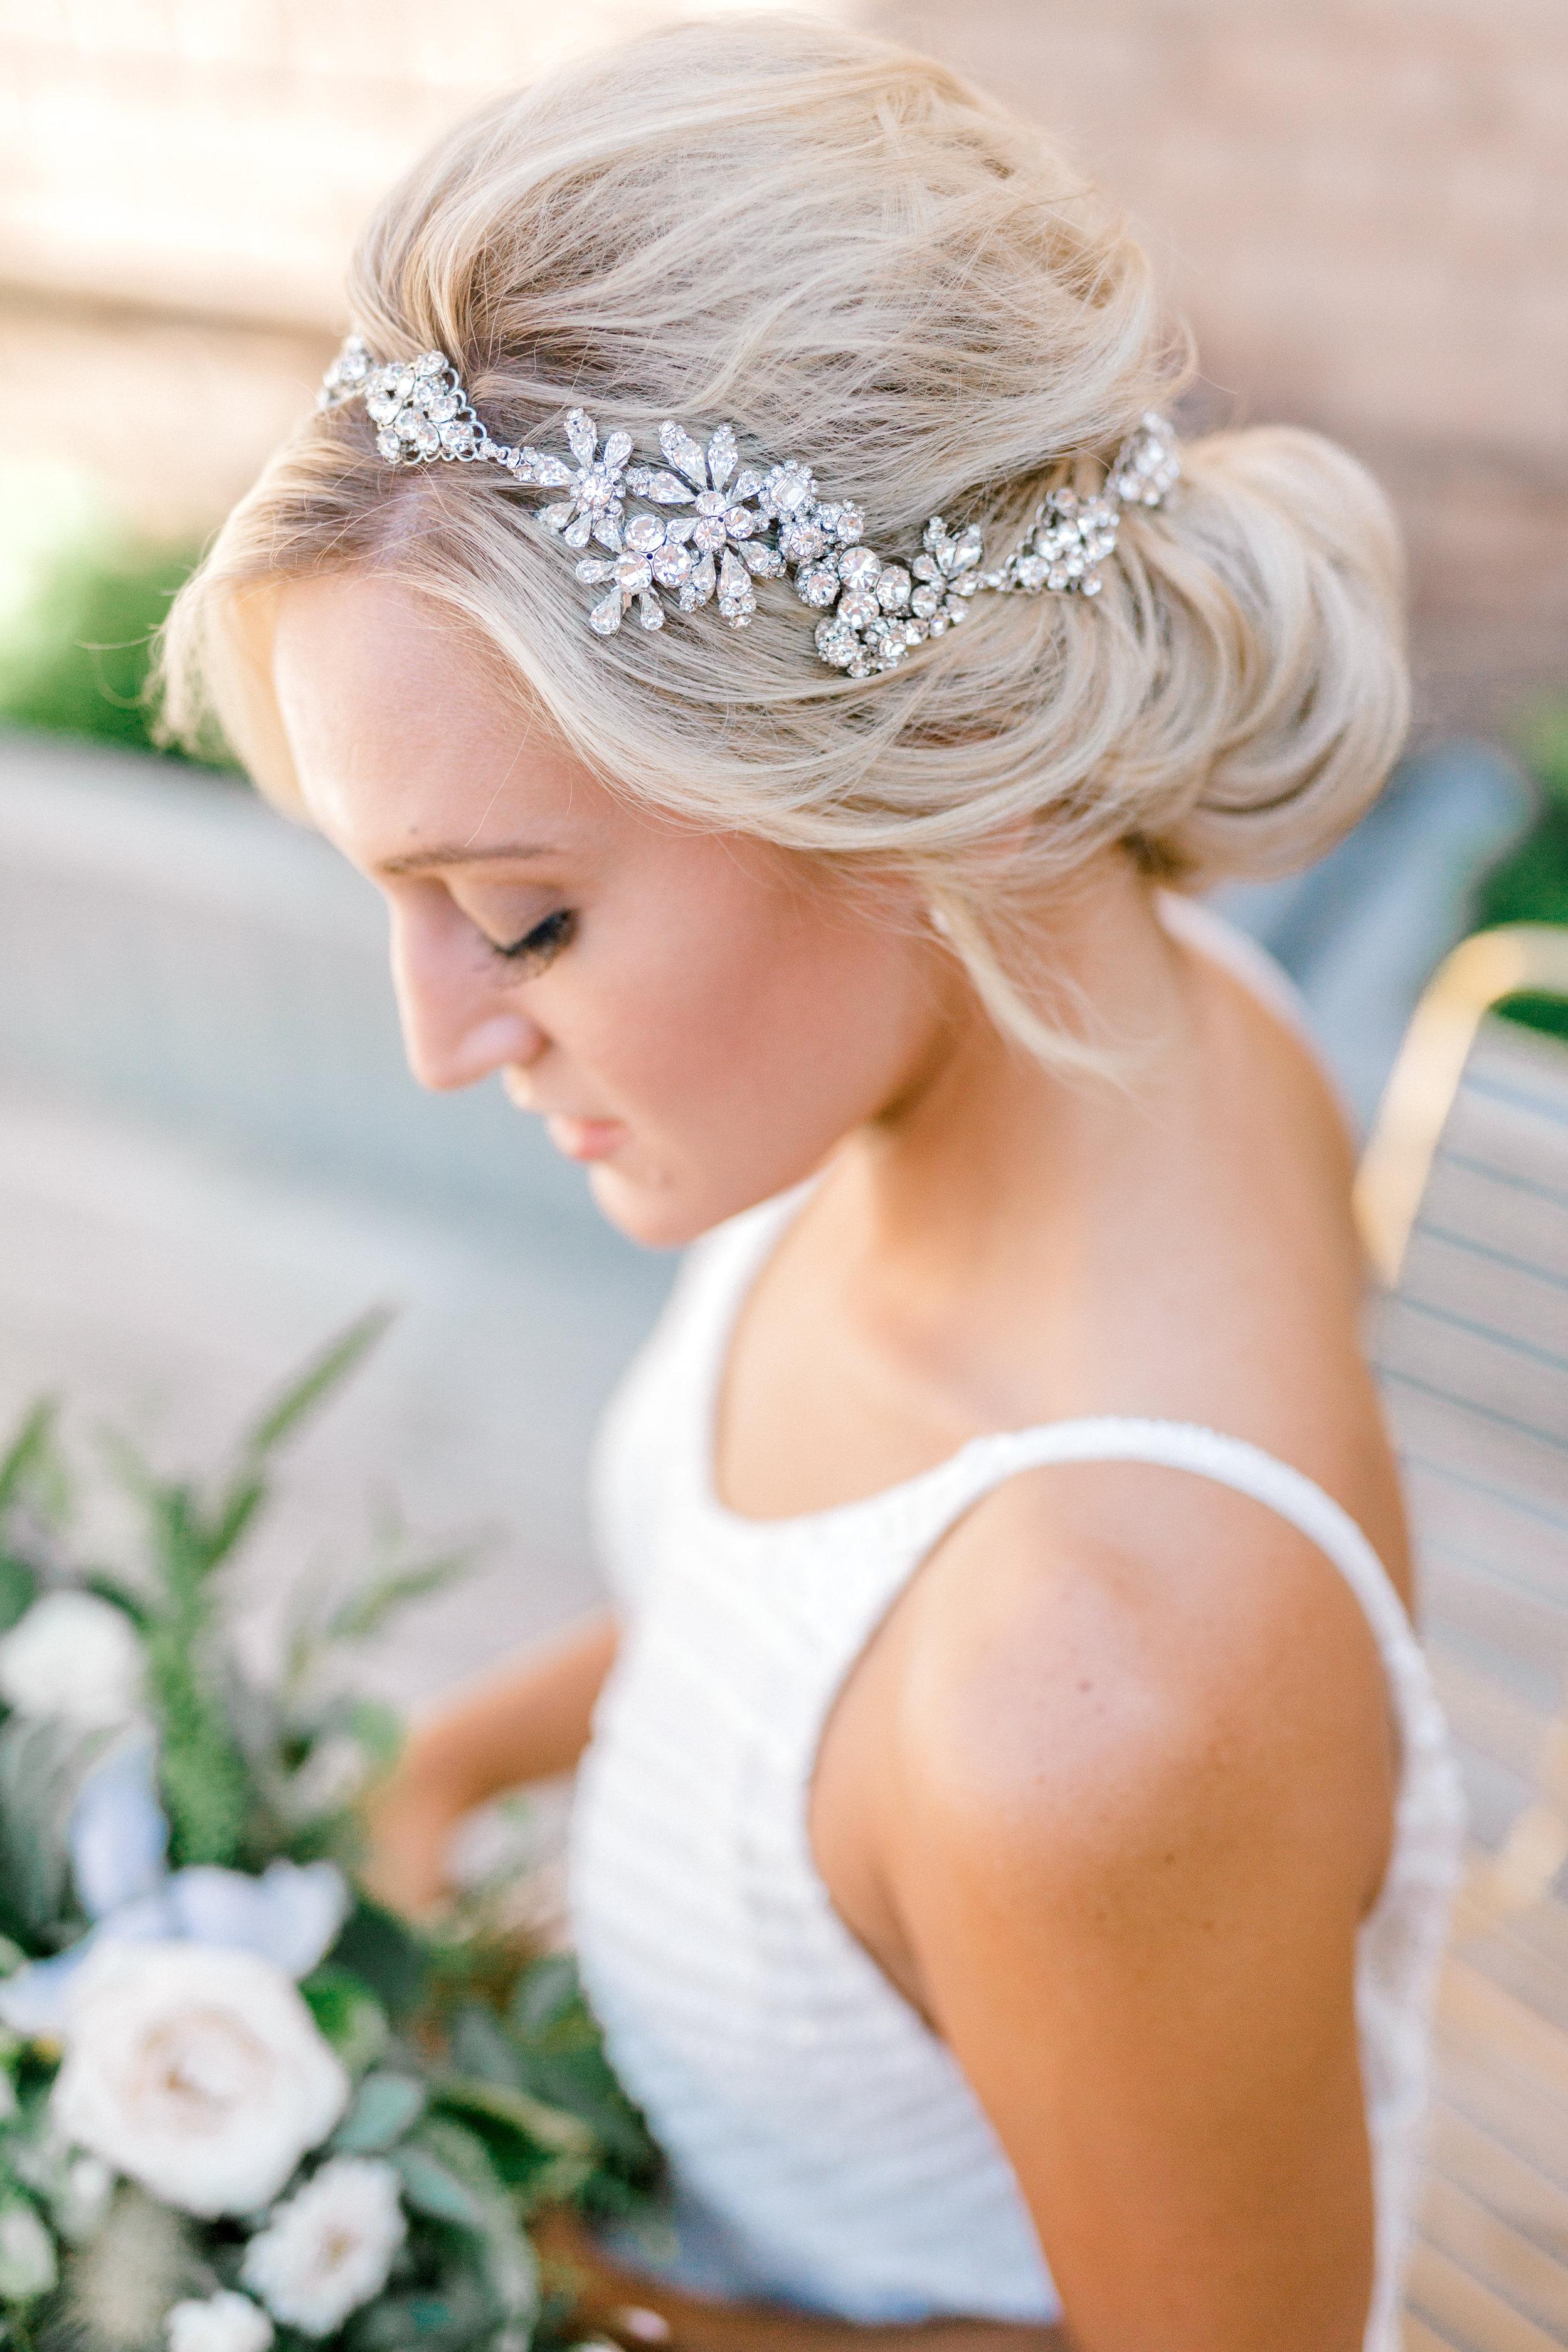 Rochester-MN-Wedding-Photographer-Finery-Boutique-53.jpg